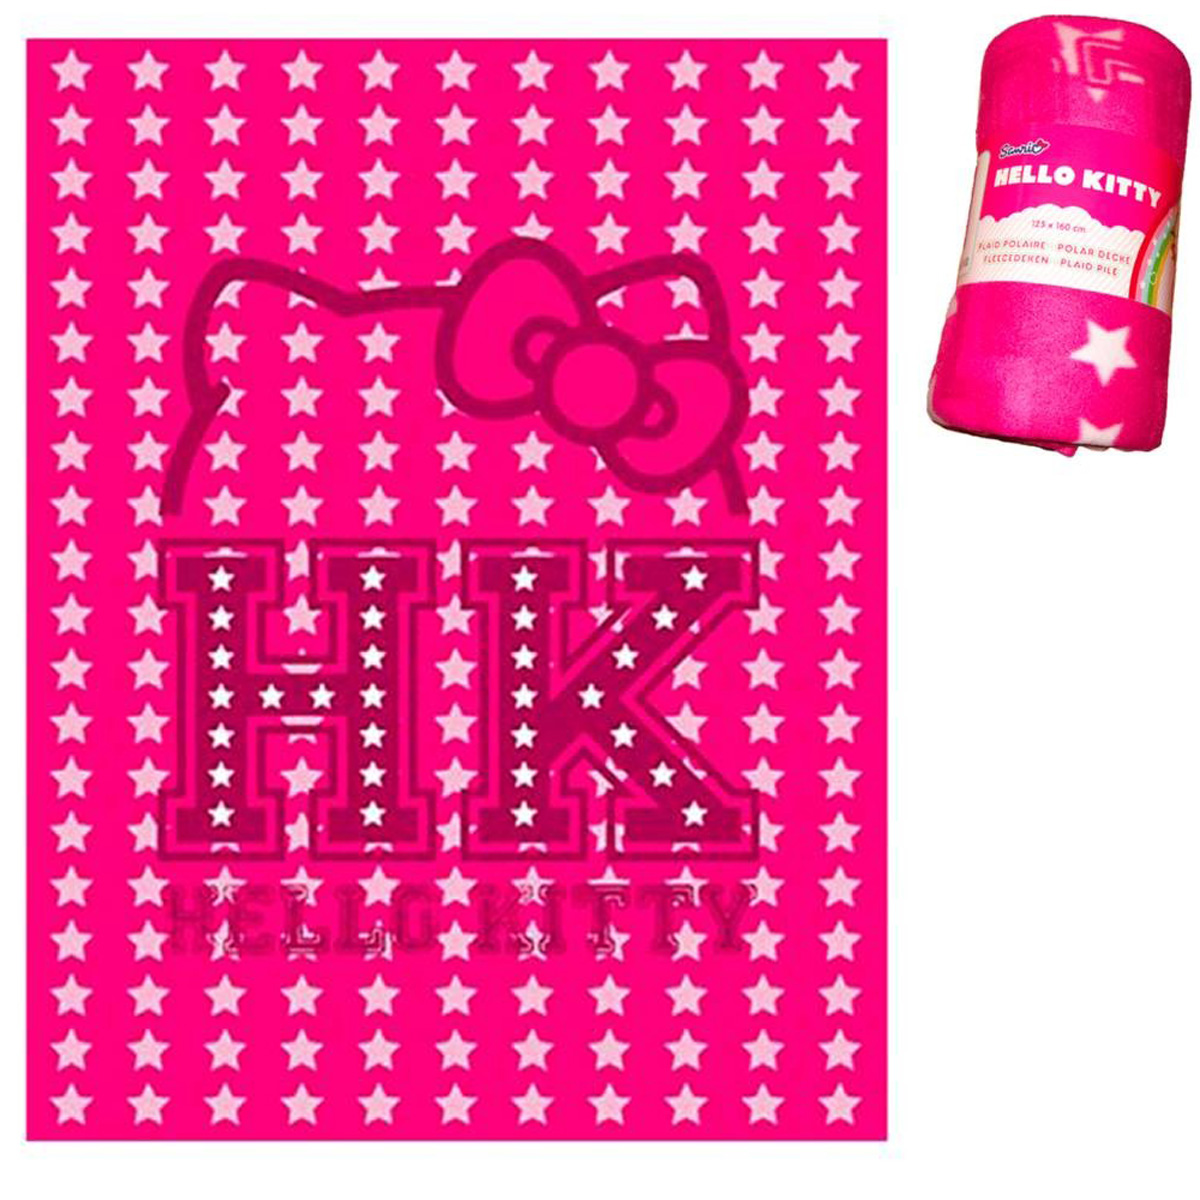 Plaid Polaire \'Hello Kitty\' rose fuschia - 125x160 cm - [Q4515]